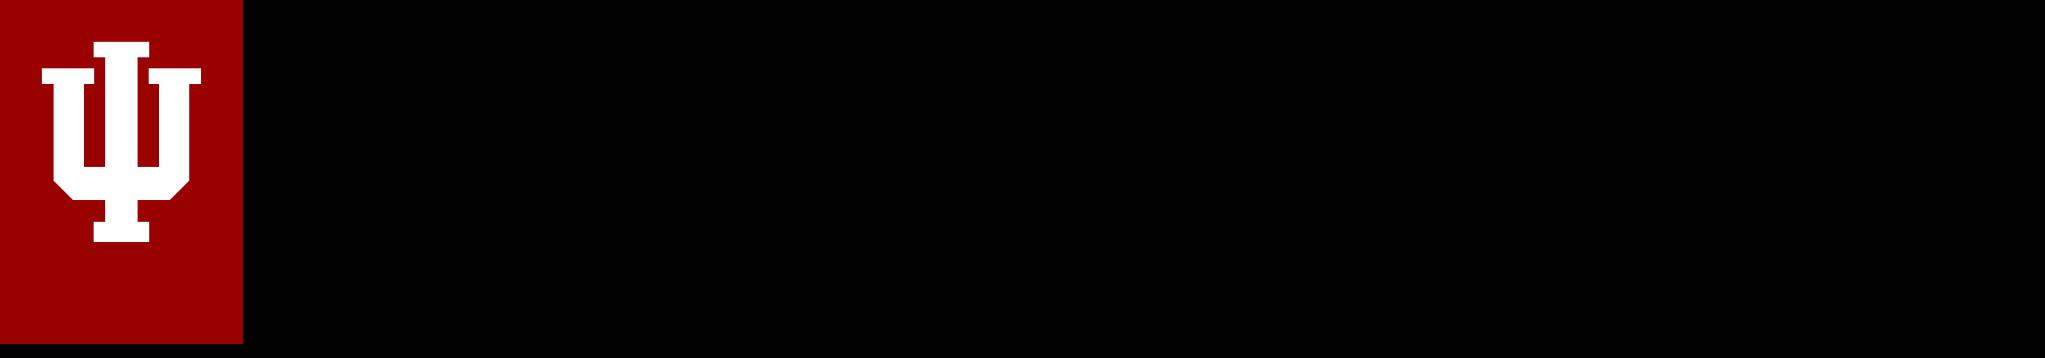 https://www.nawboindy.org/wp-content/uploads/IUPUI-Logo.png